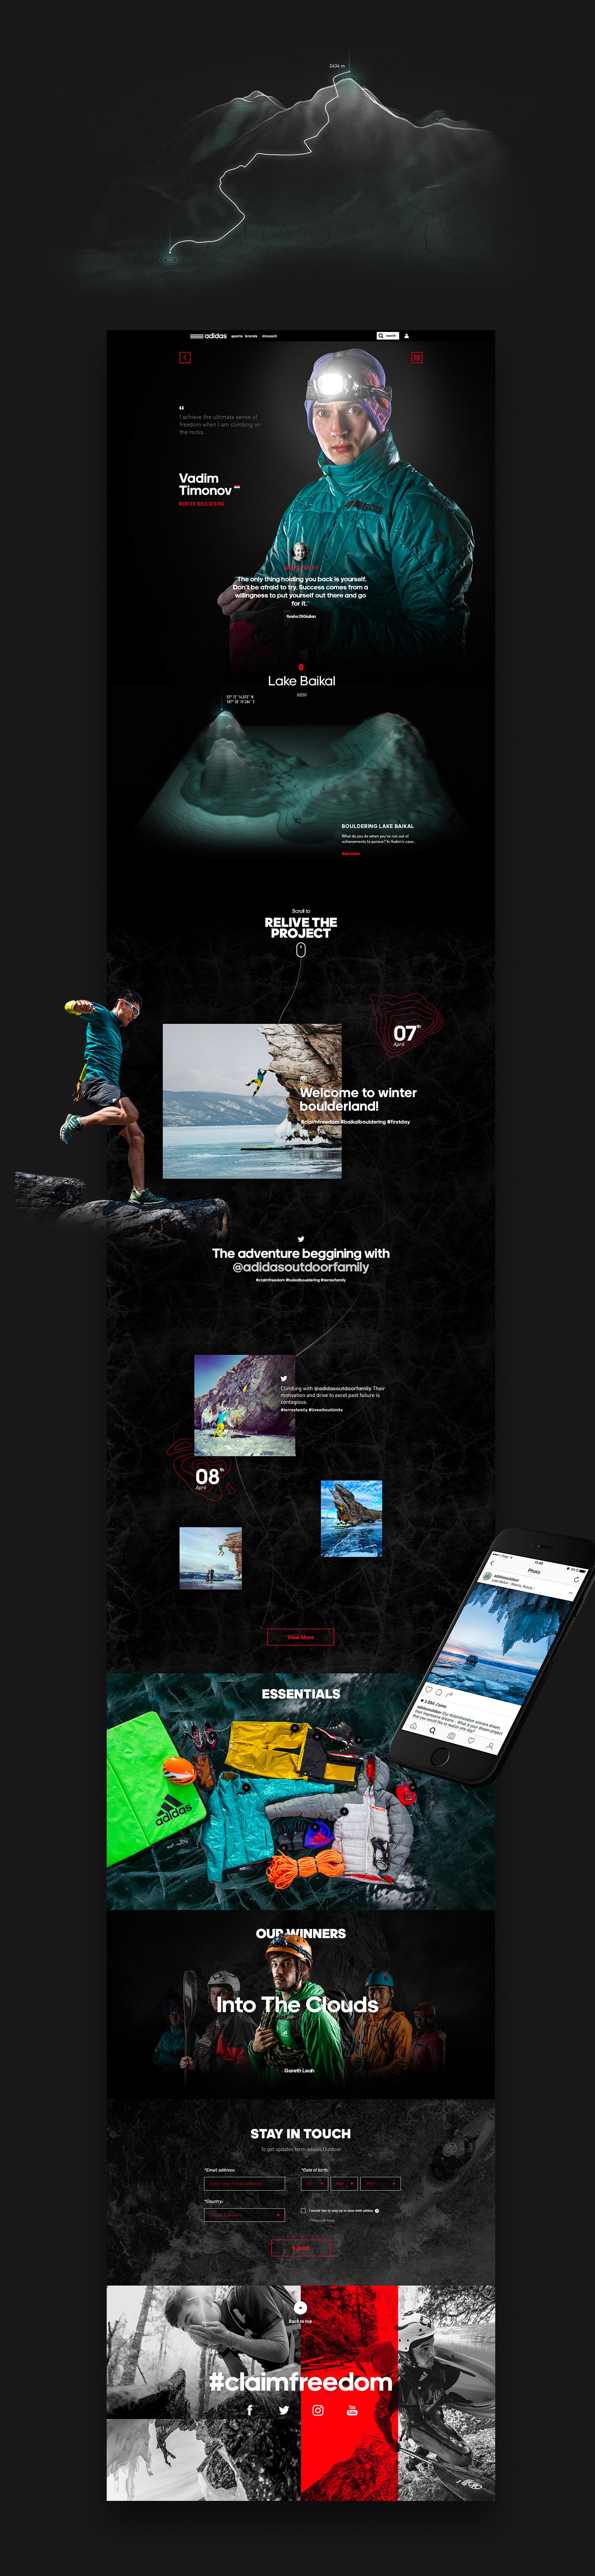 adidas-screen-02-V2